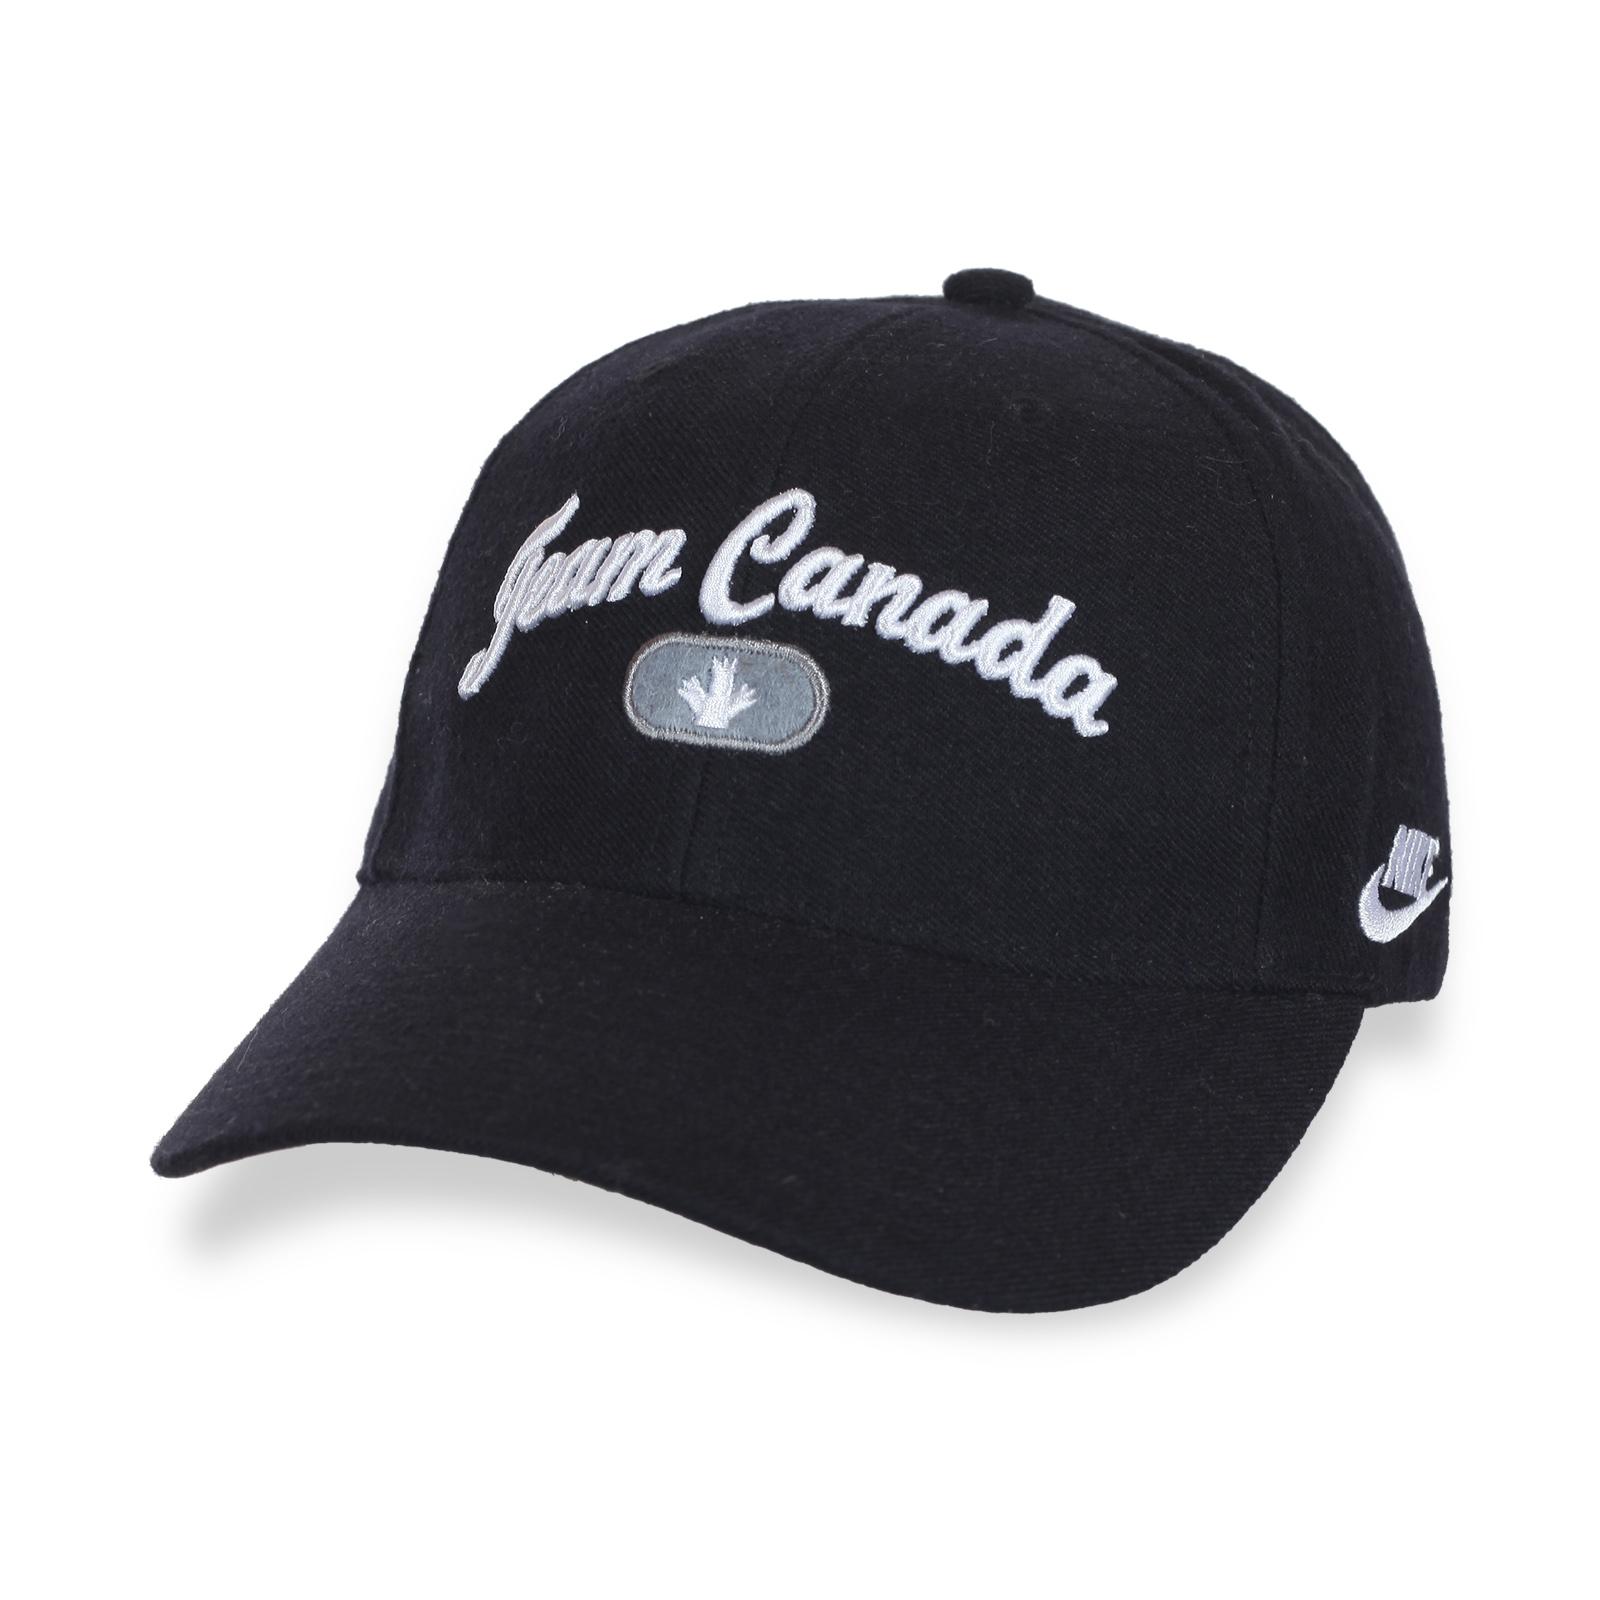 Комфортная бейсболка Team Canada.